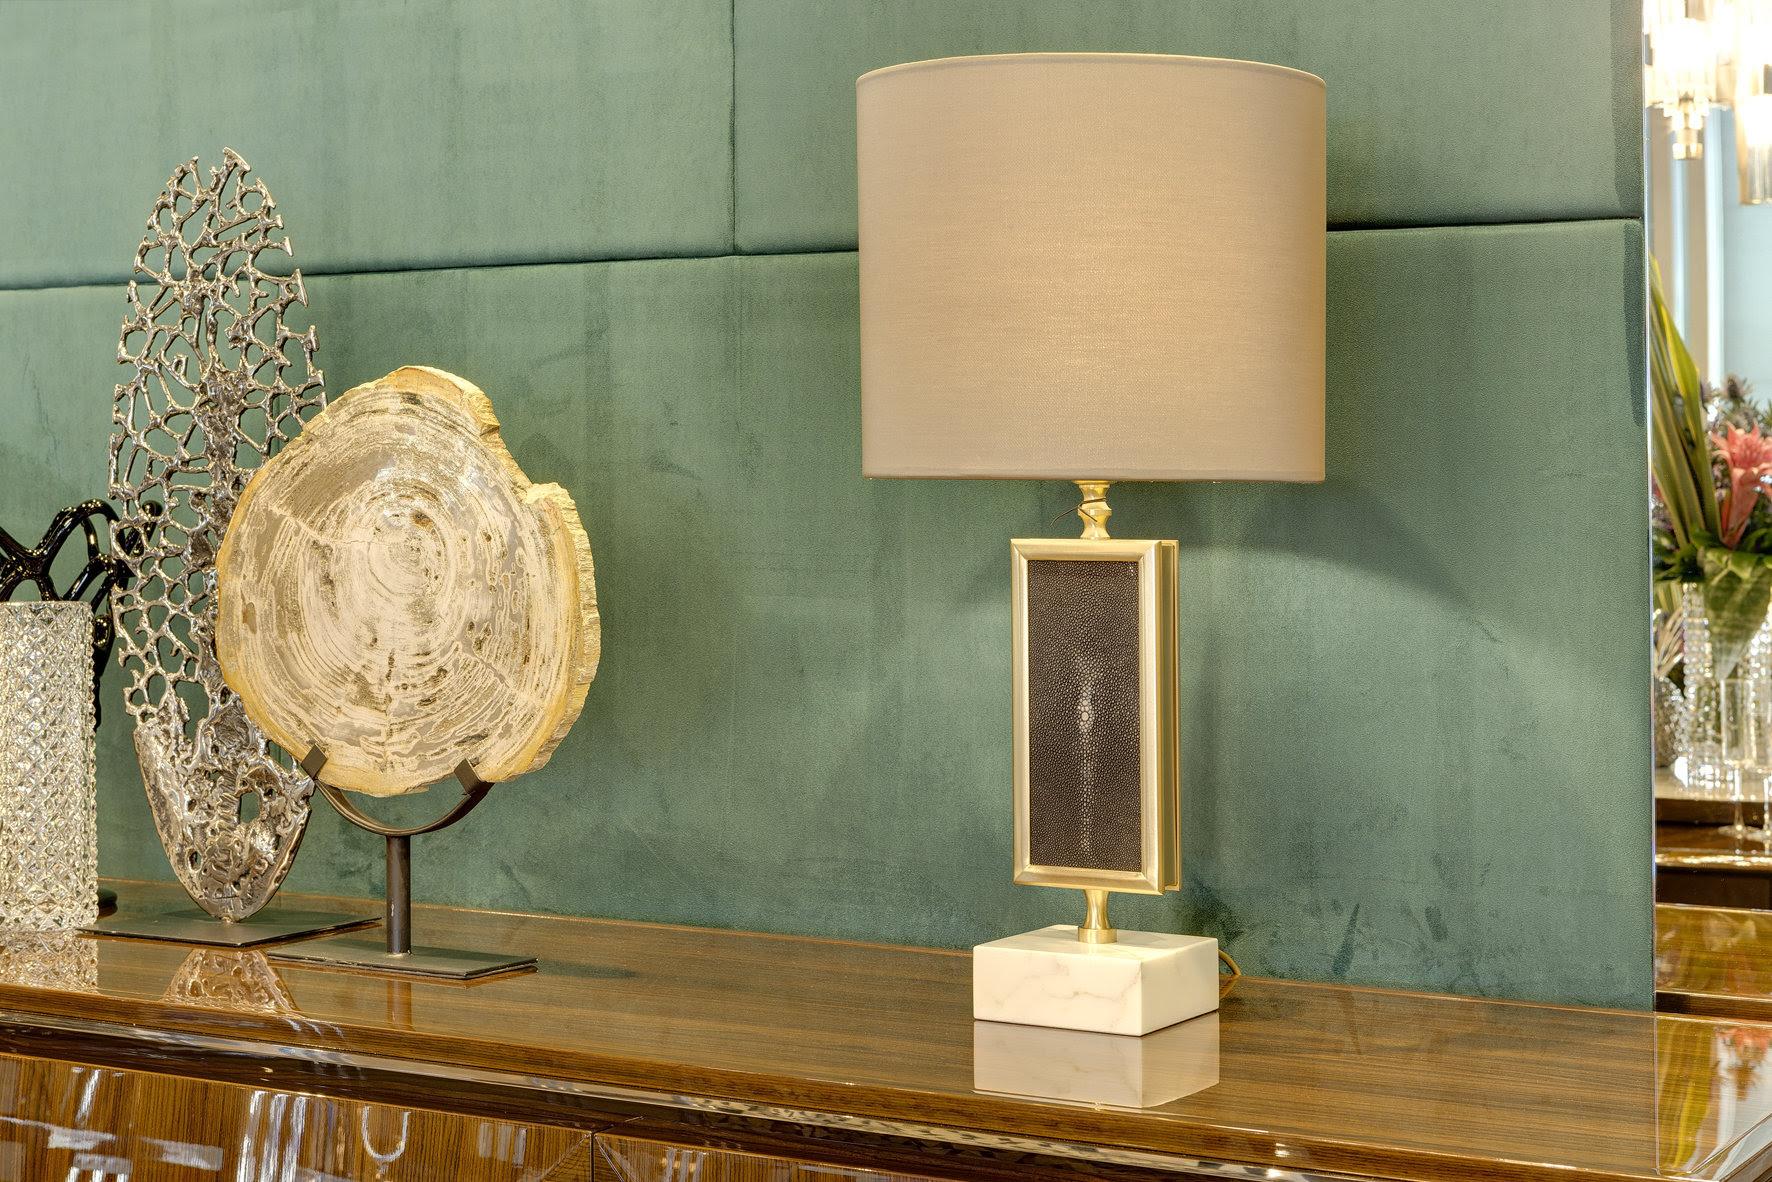 MSH at Salone - Officina Luce new Flute tble lamp with shagreen detail - Masha Shapiro Agency UK .jpg